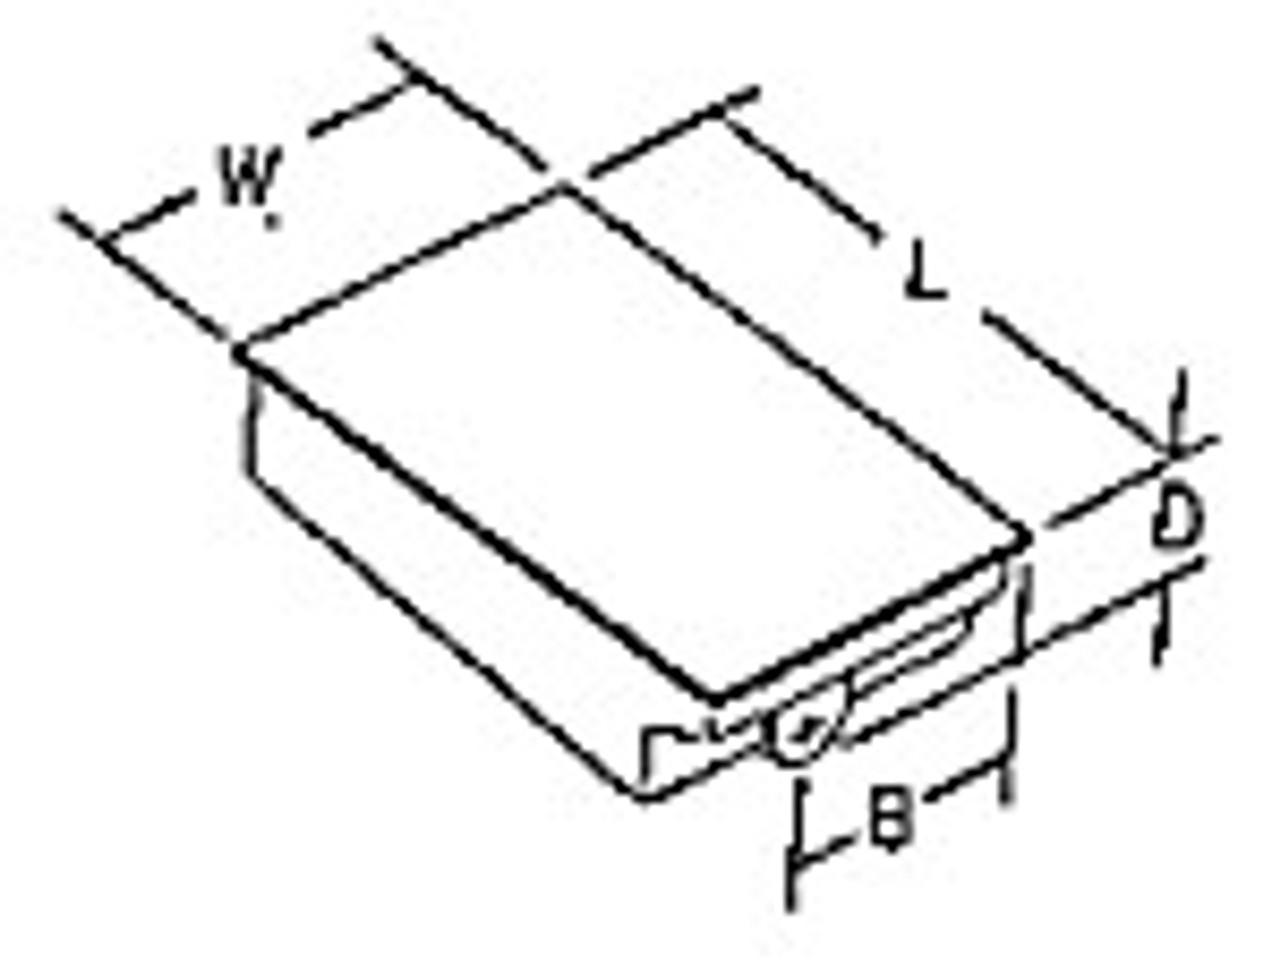 ABS HOLDING TANK END DRAIN - 29 GALLON (11-1068)